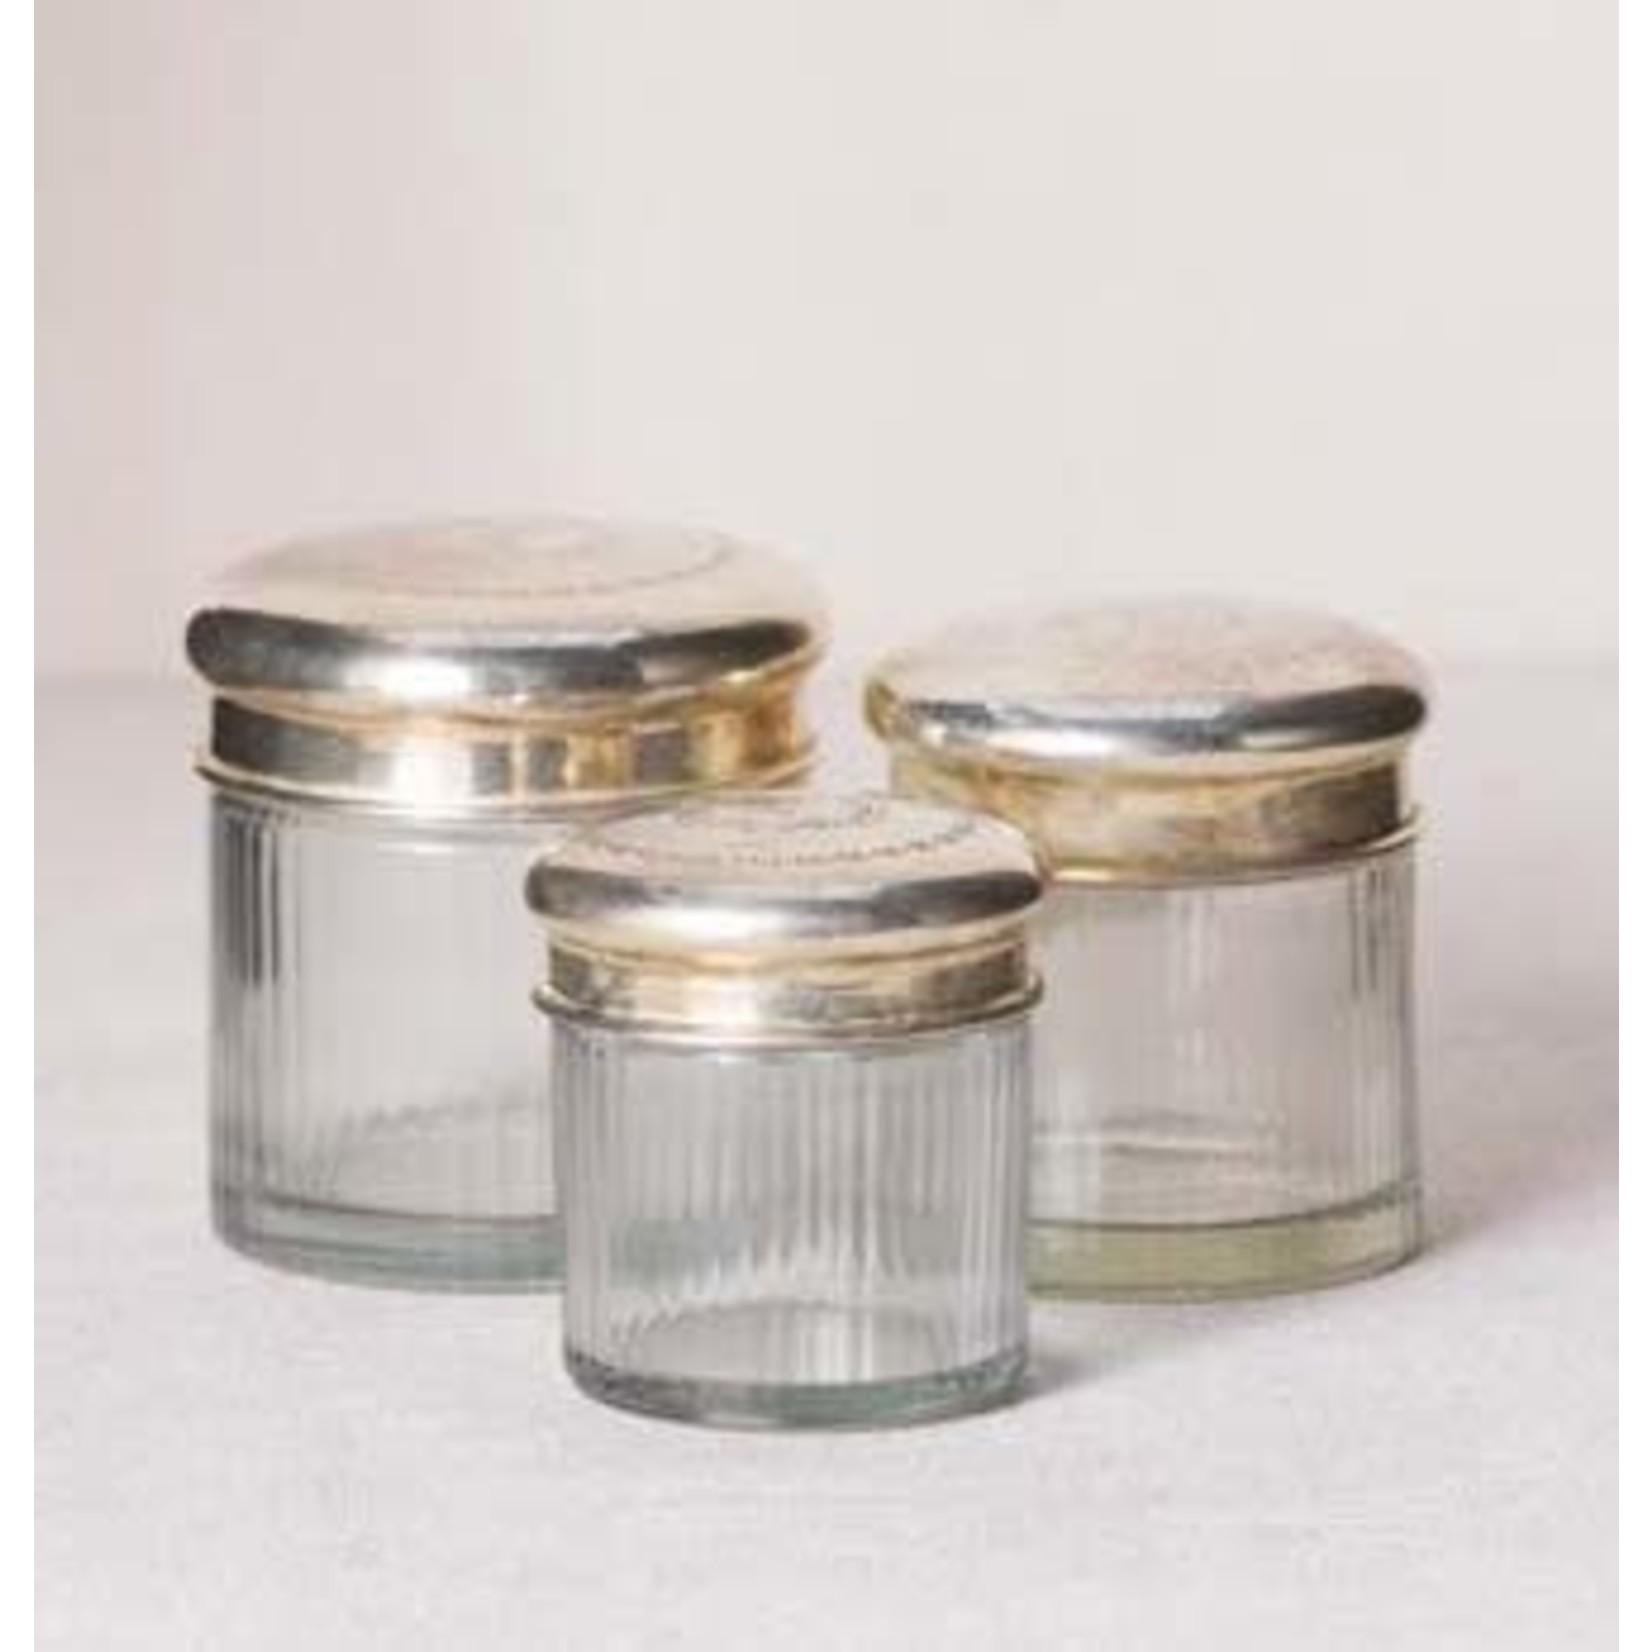 CHEHOMA 3 SET OF JAR WITH STRIPES & IRONTOP